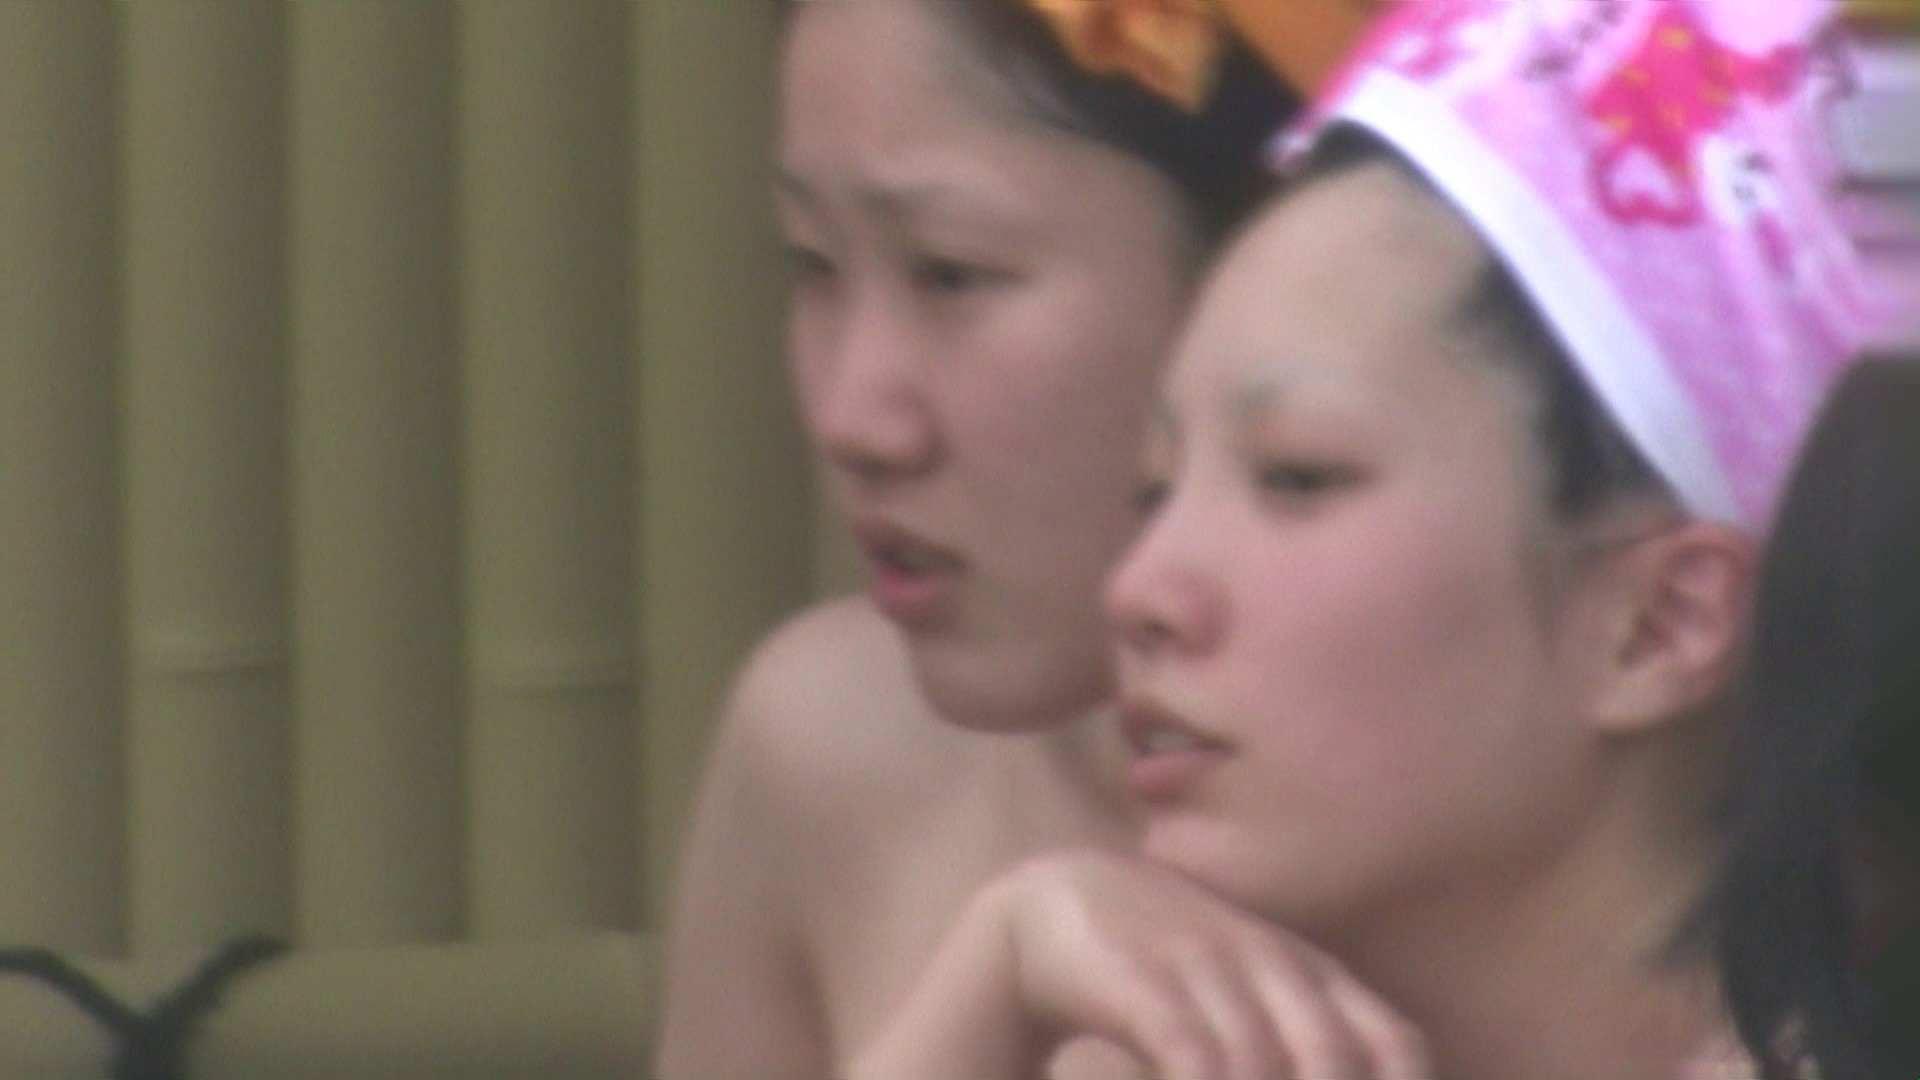 Aquaな露天風呂Vol.51【VIP限定】 OLセックス 盗み撮りオマンコ動画キャプチャ 56画像 38